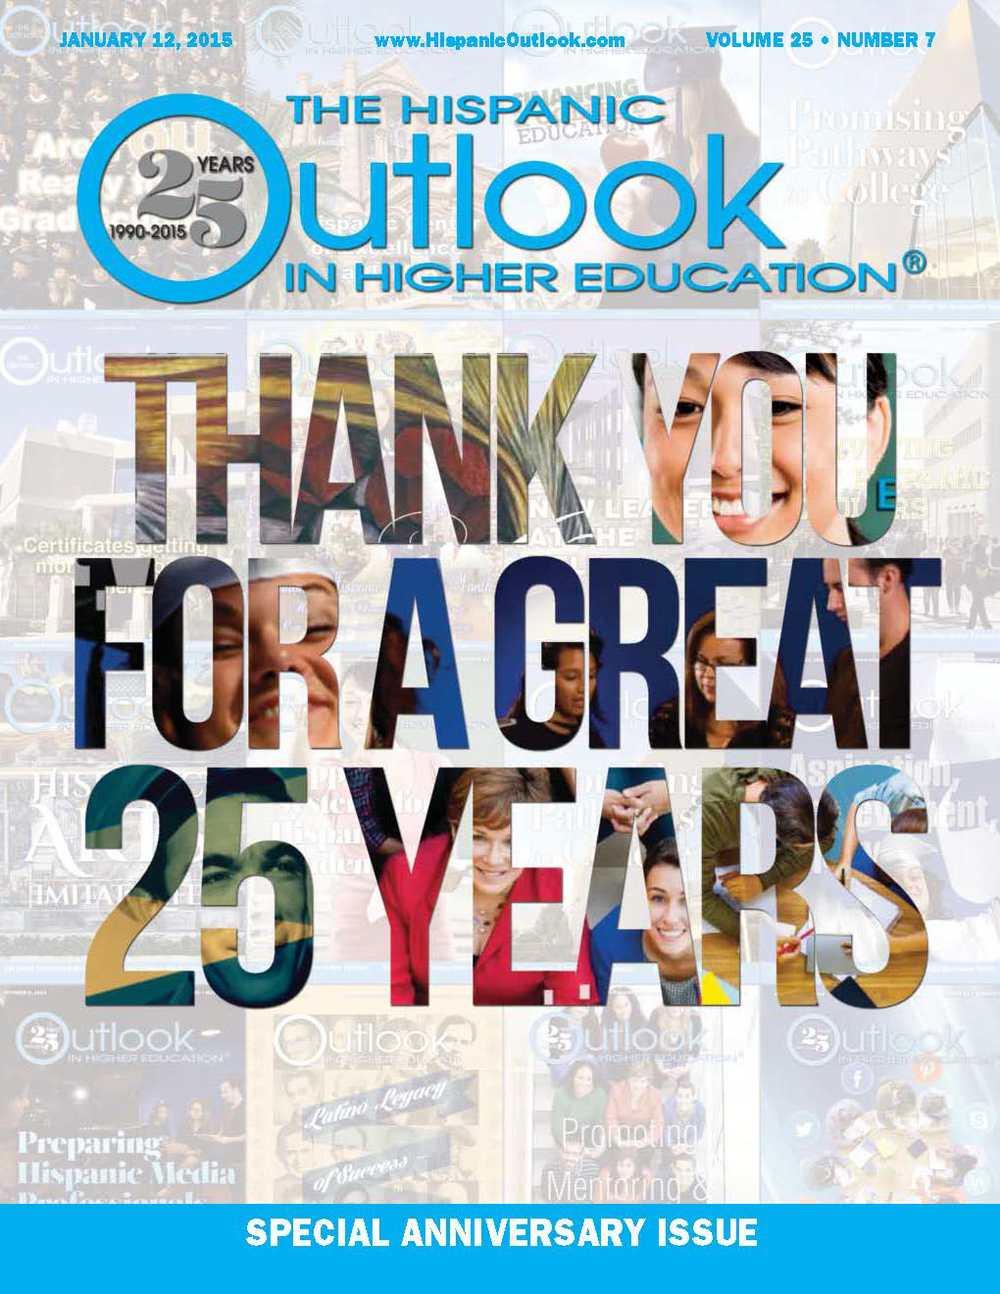 The Hispanic Outlook Magazine